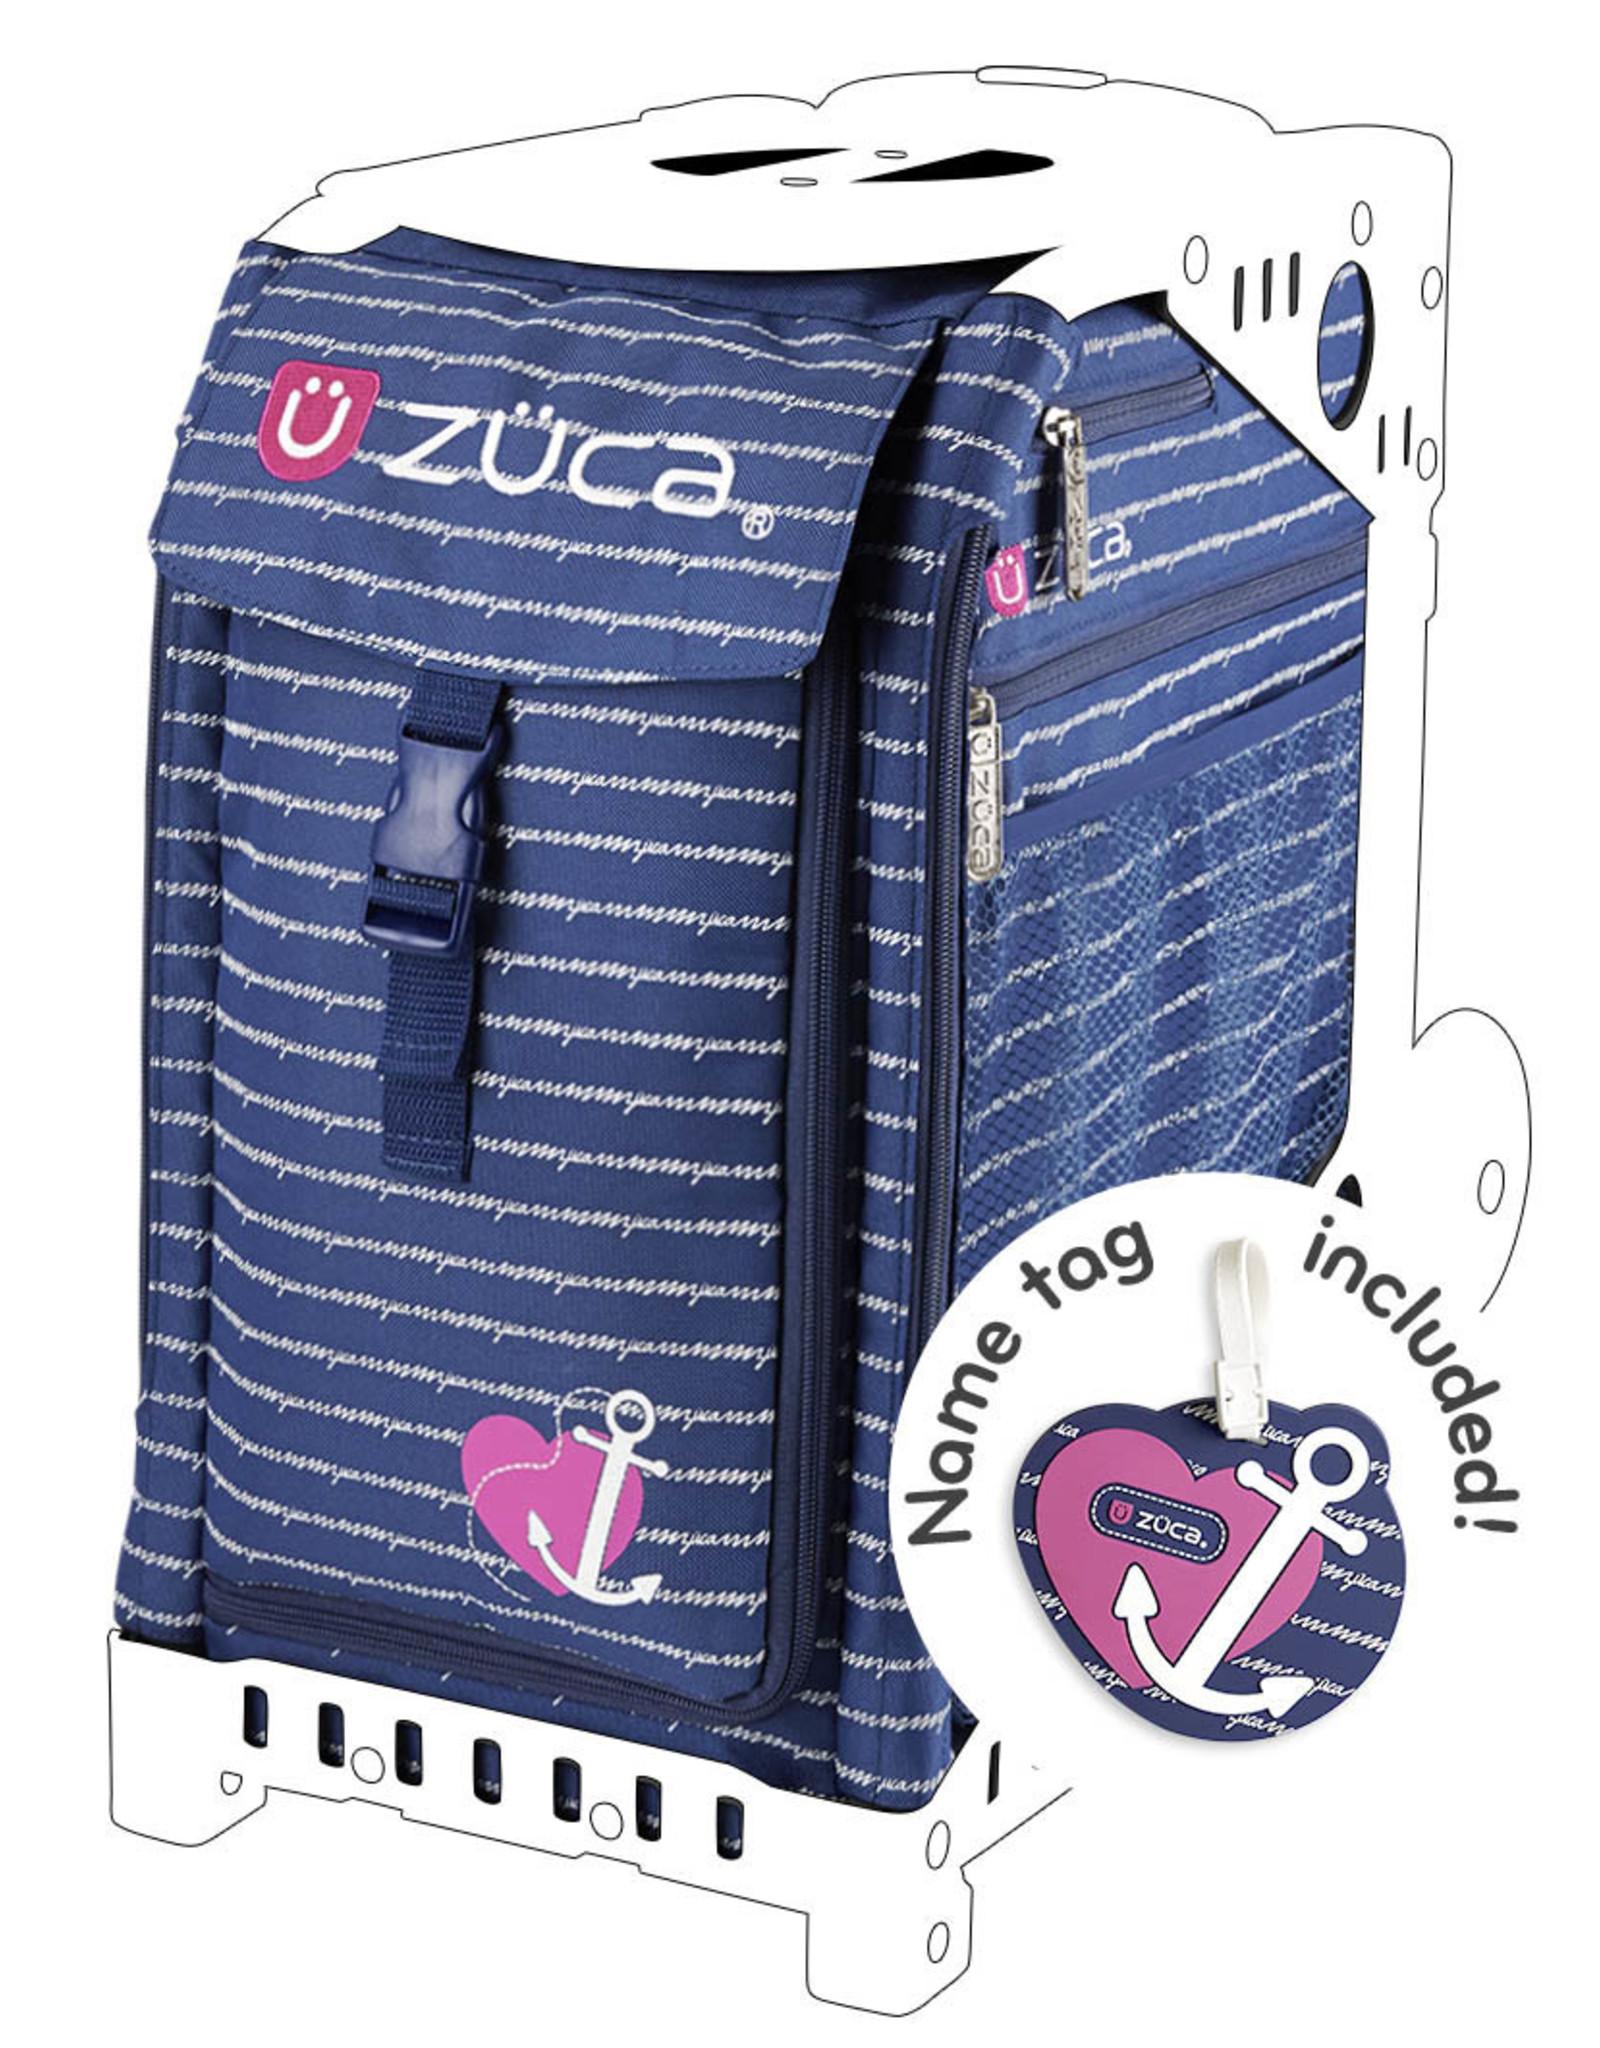 Zuca Zuca Bag Insert - Print